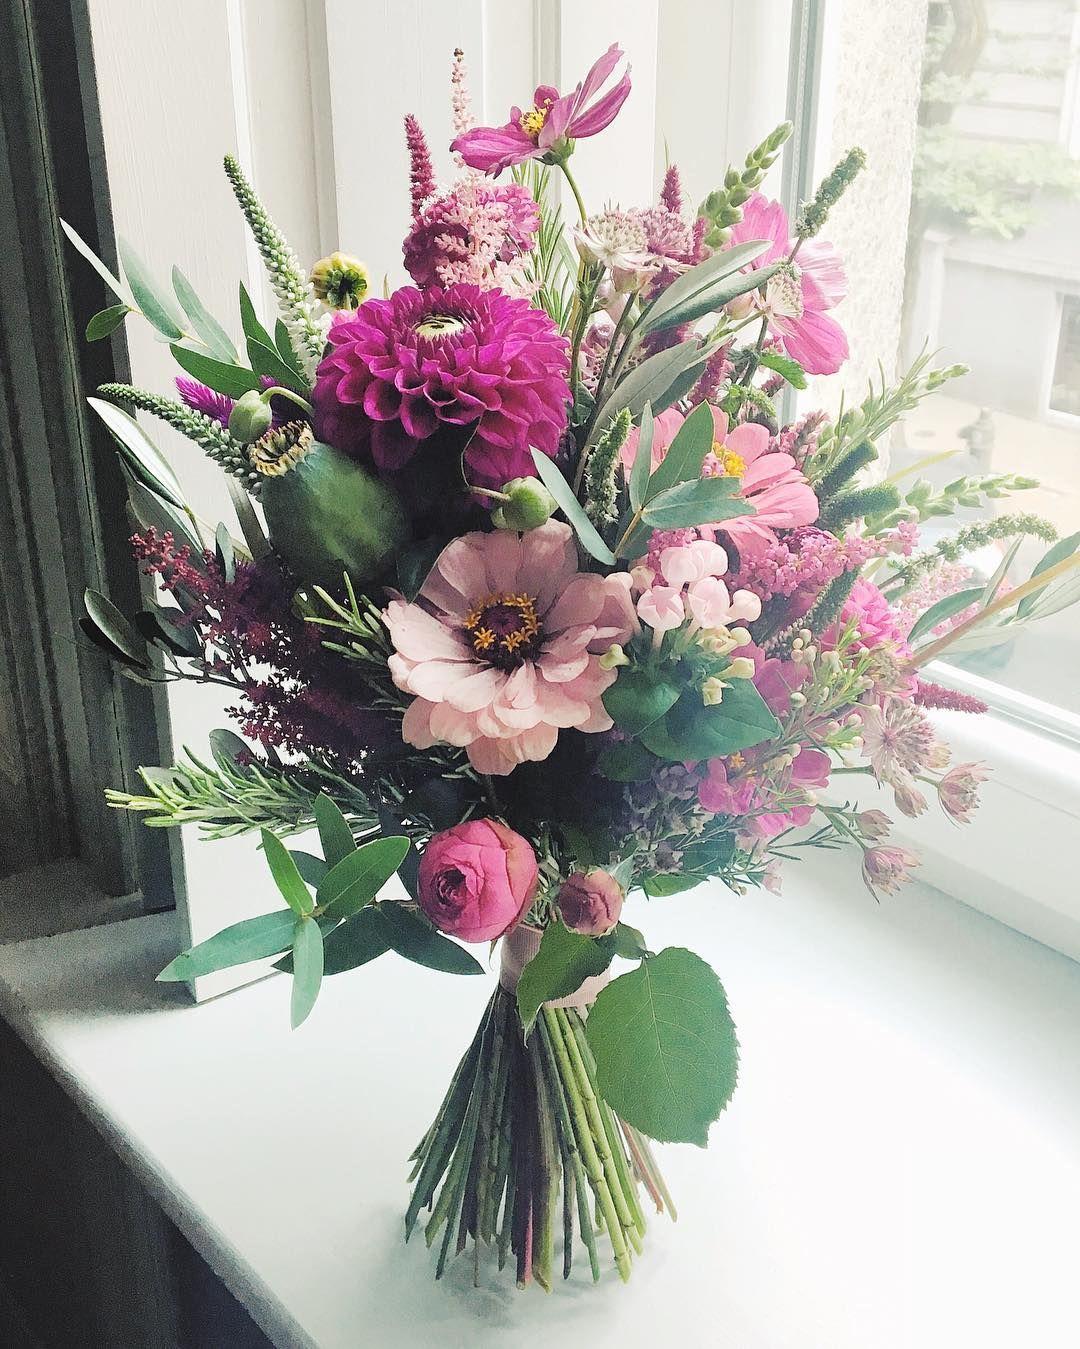 1 205 Likes 9 Comments Kwiaciarnia Kwiaty Amp Miut Kwiatyimiut On Instagram Kwiatysapiekne Wedding Floral Wreath Instagram Posts My Wedding